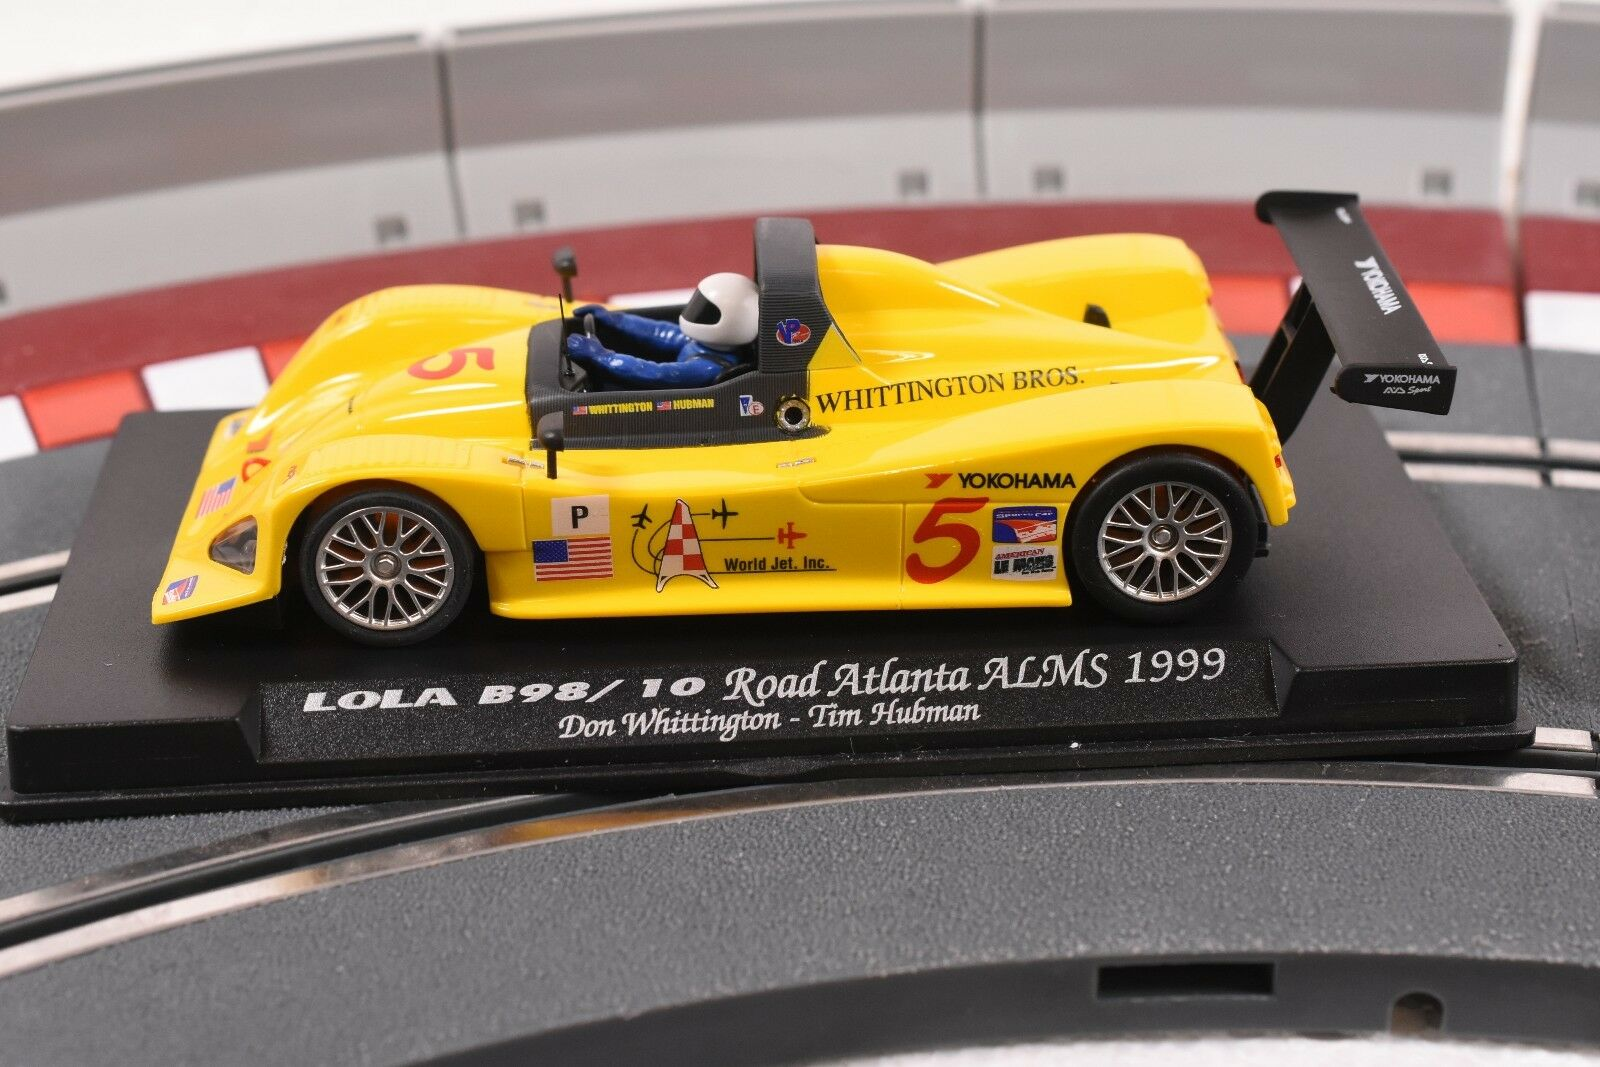 88038 FLY CAR MODEL 1 32 SLOT CAR LOLA B98 10 ROAD ATLANTA ALMS 1999 A-501